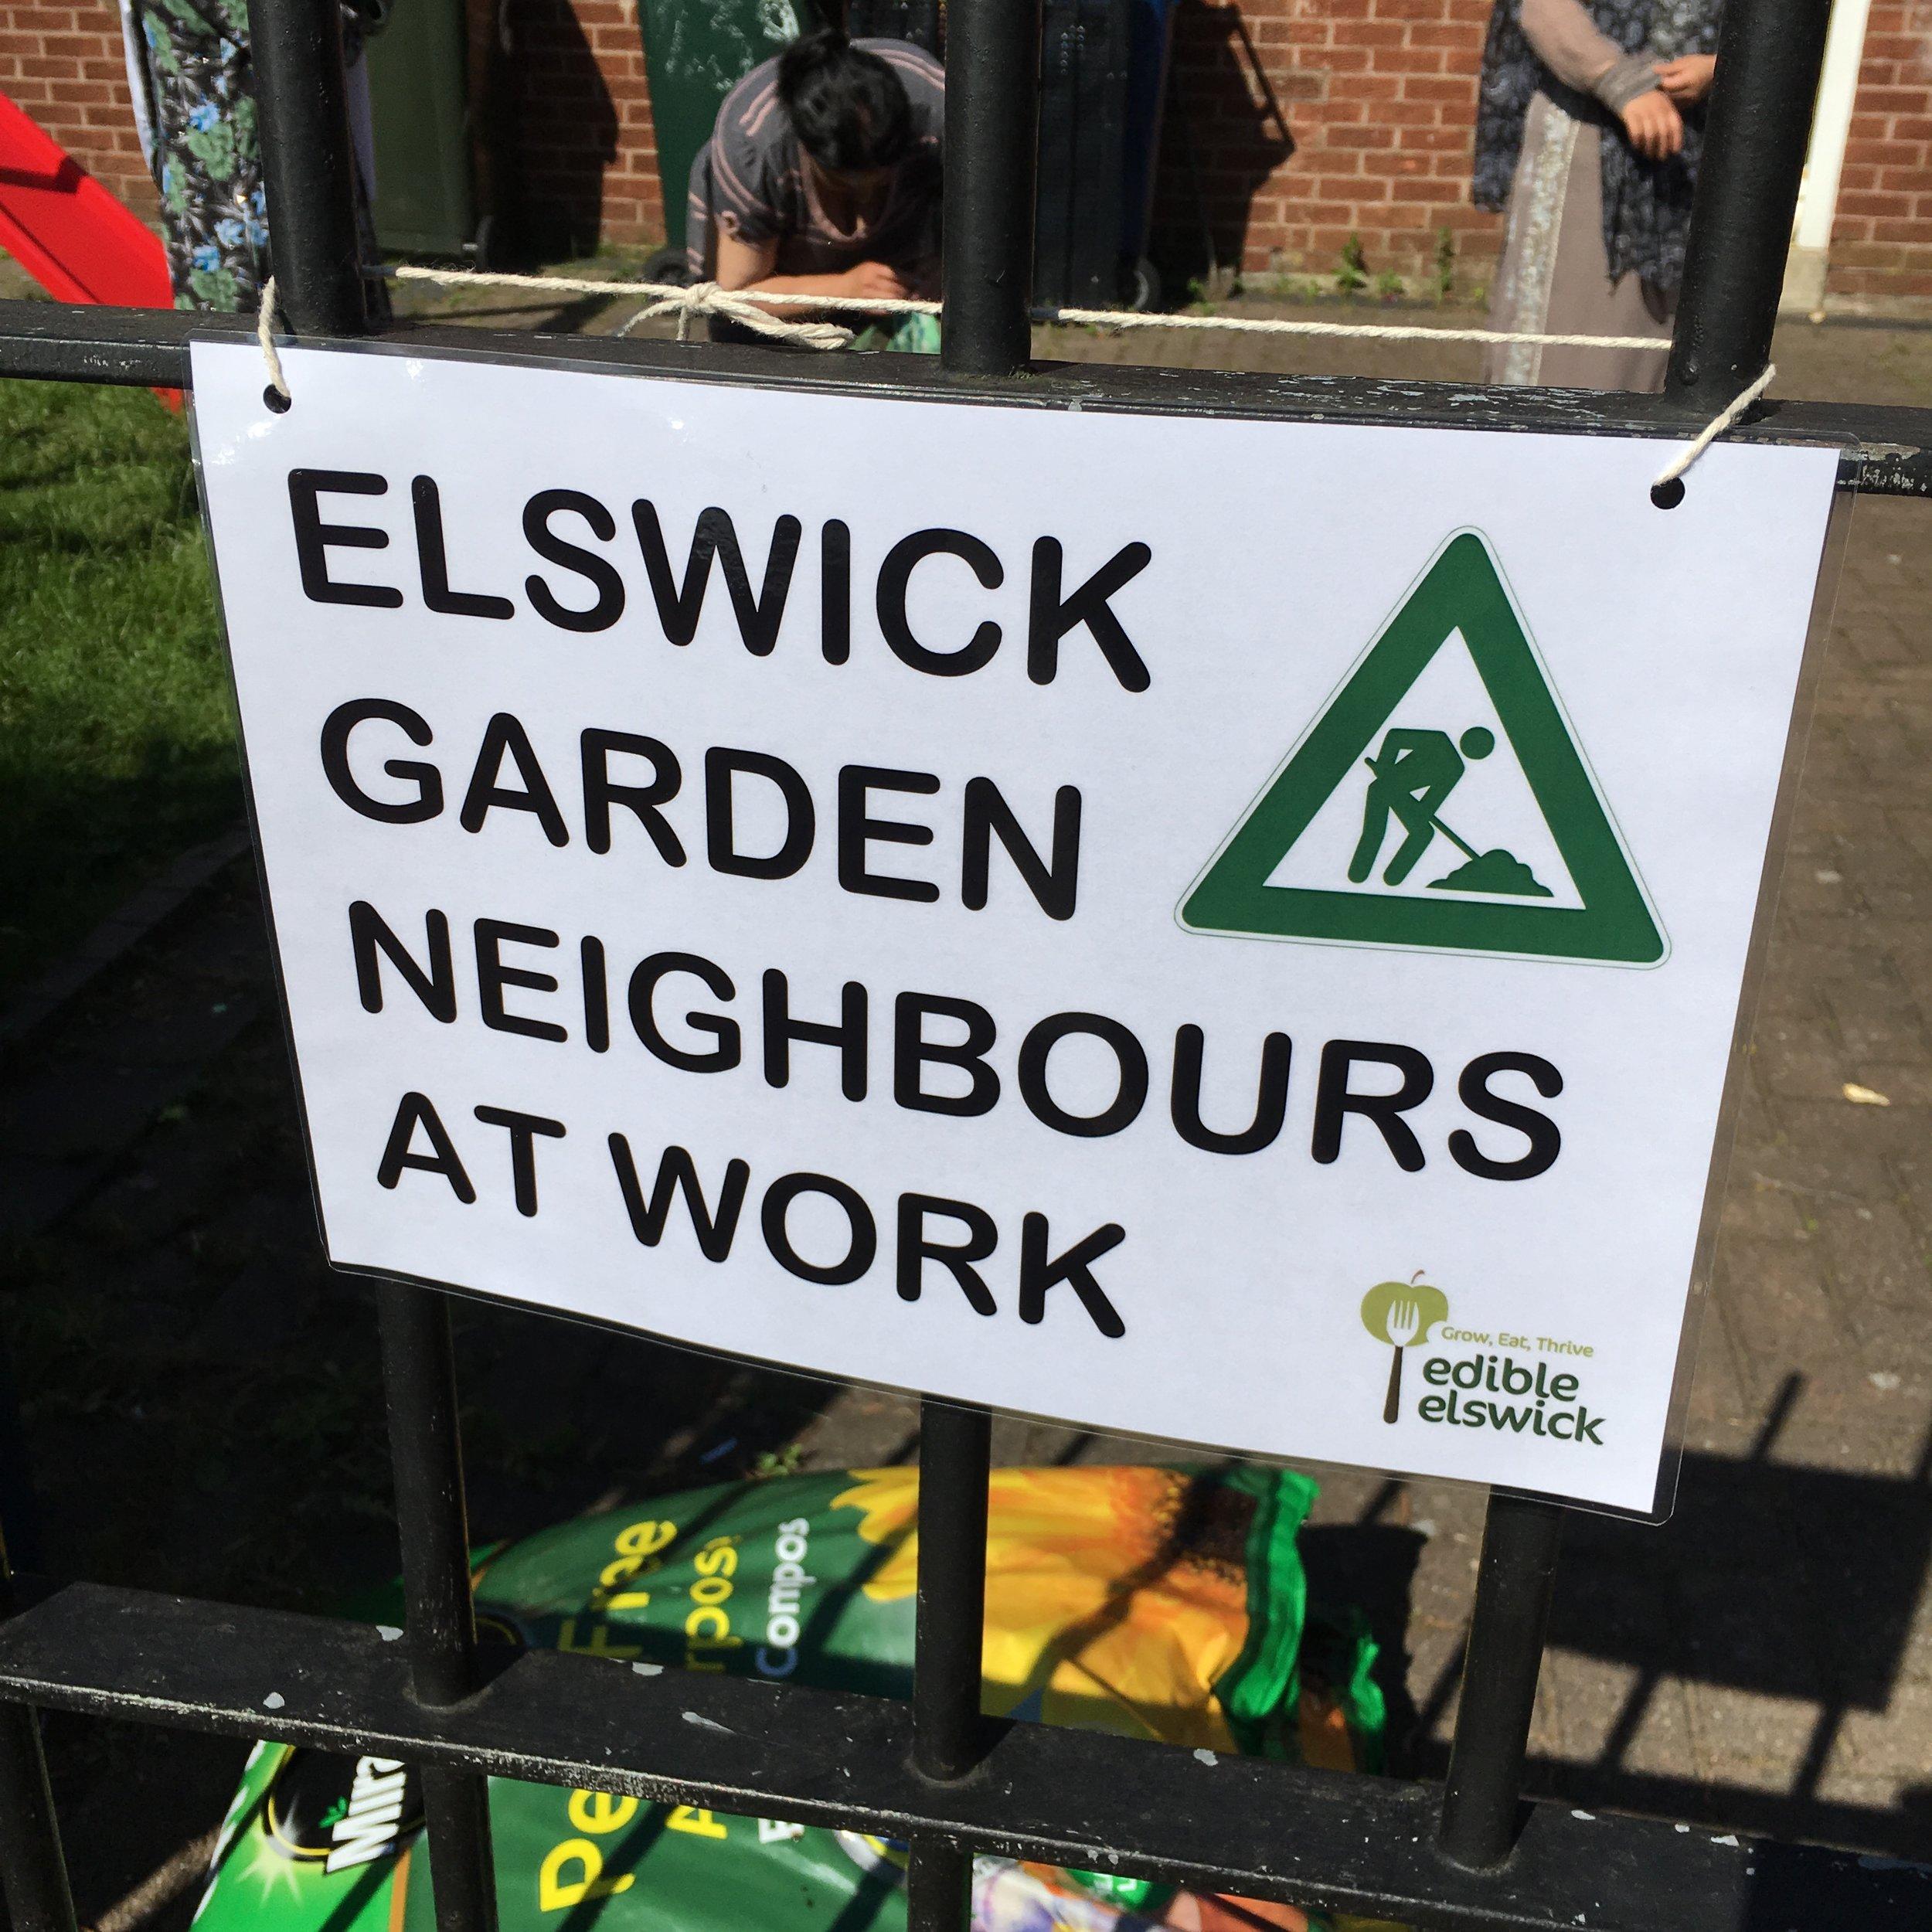 Elswick Garden Neighbours - Sign.jpg